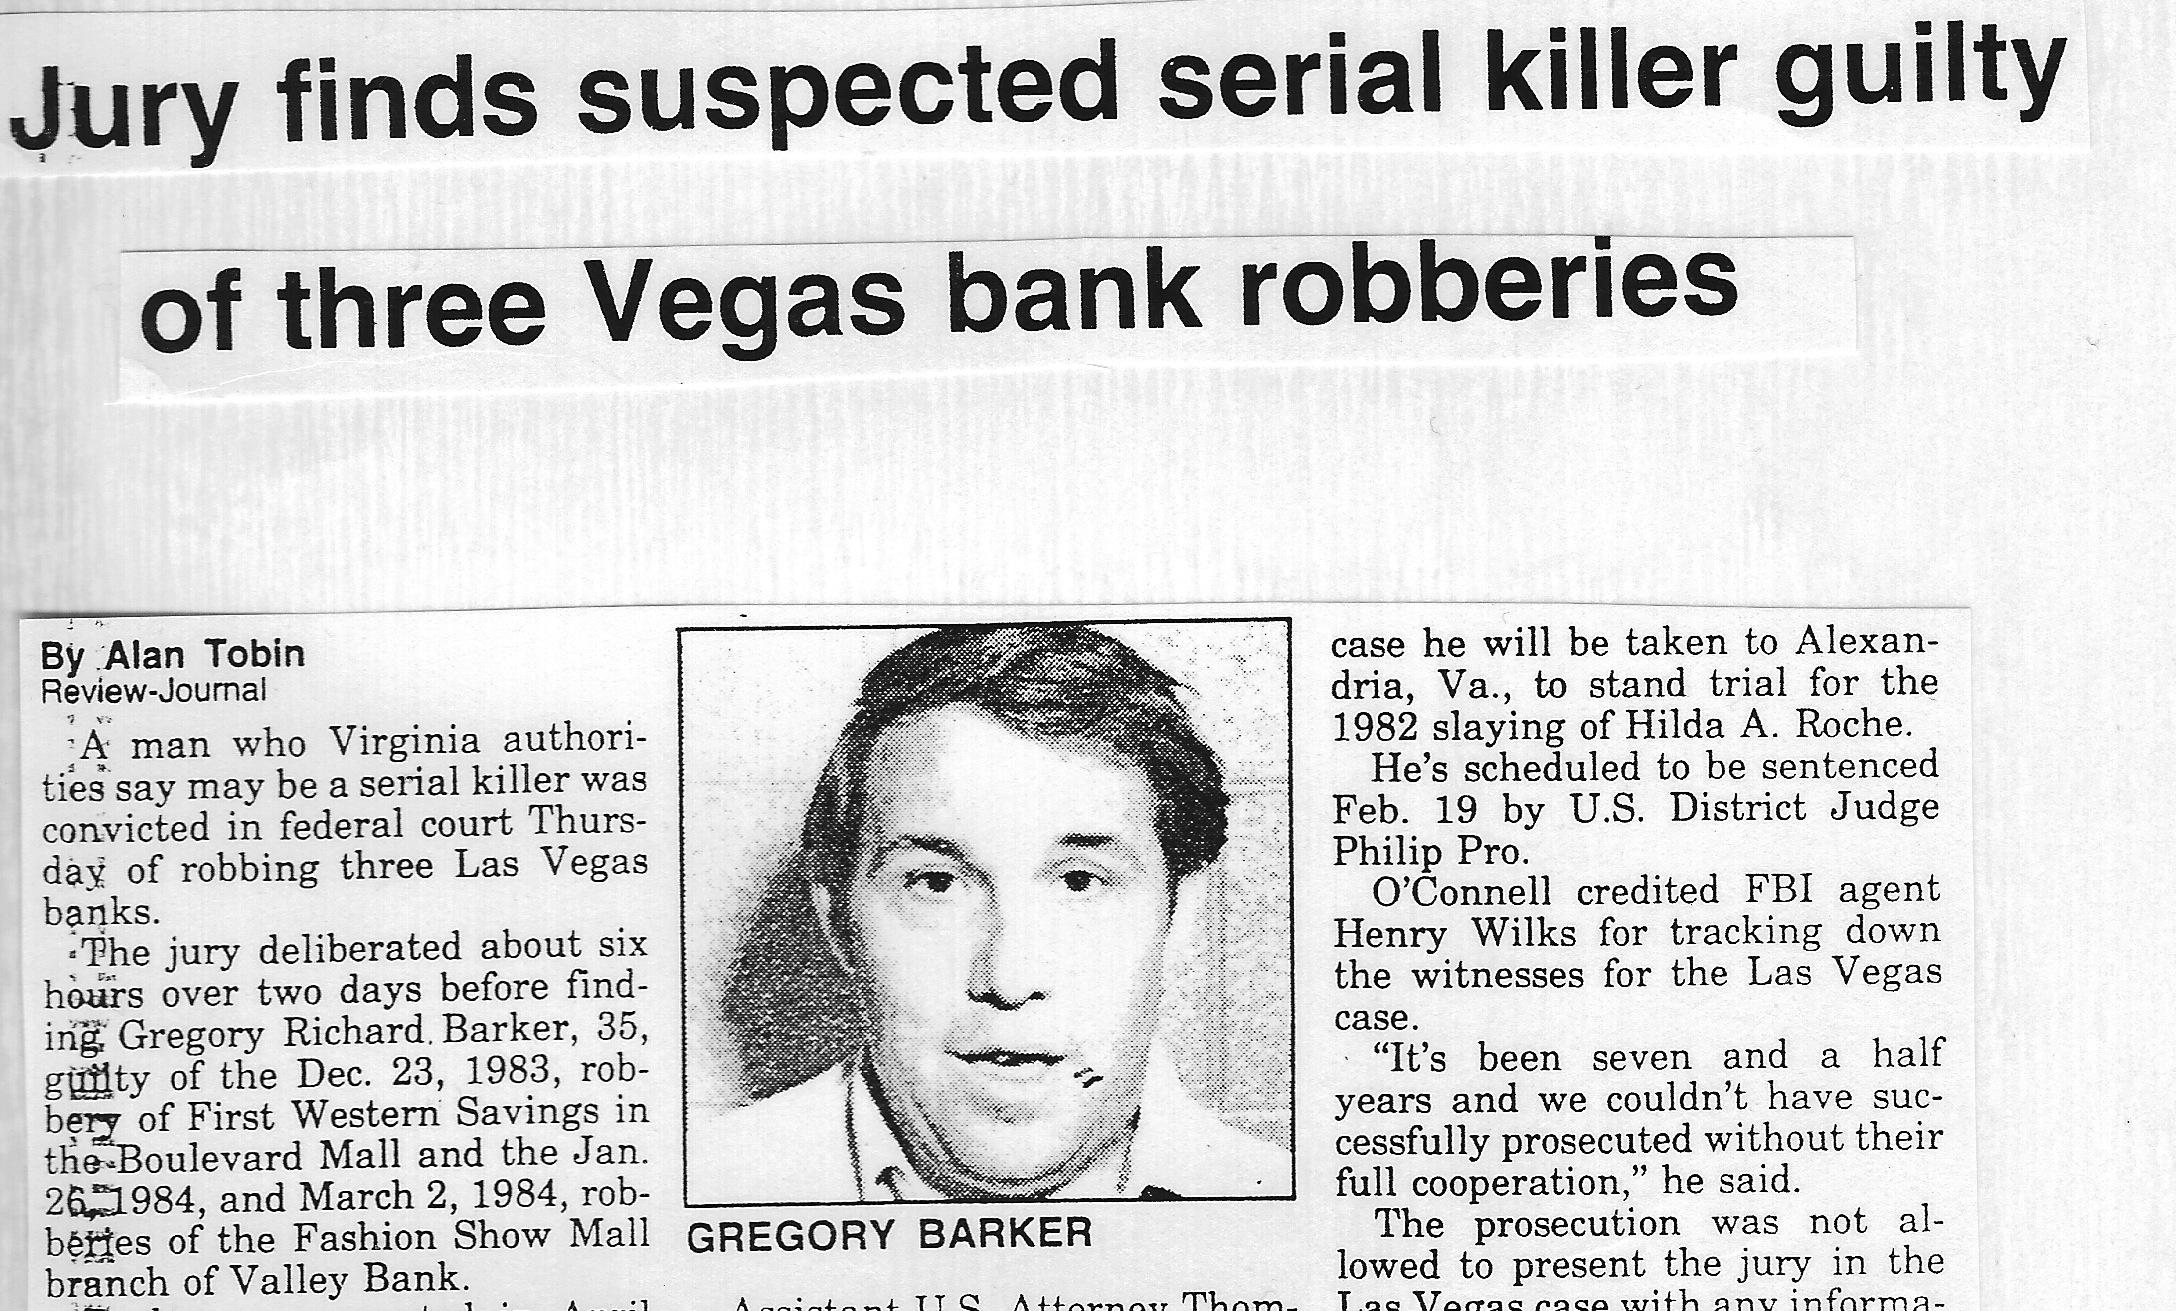 Gregory Richard Barker Headline